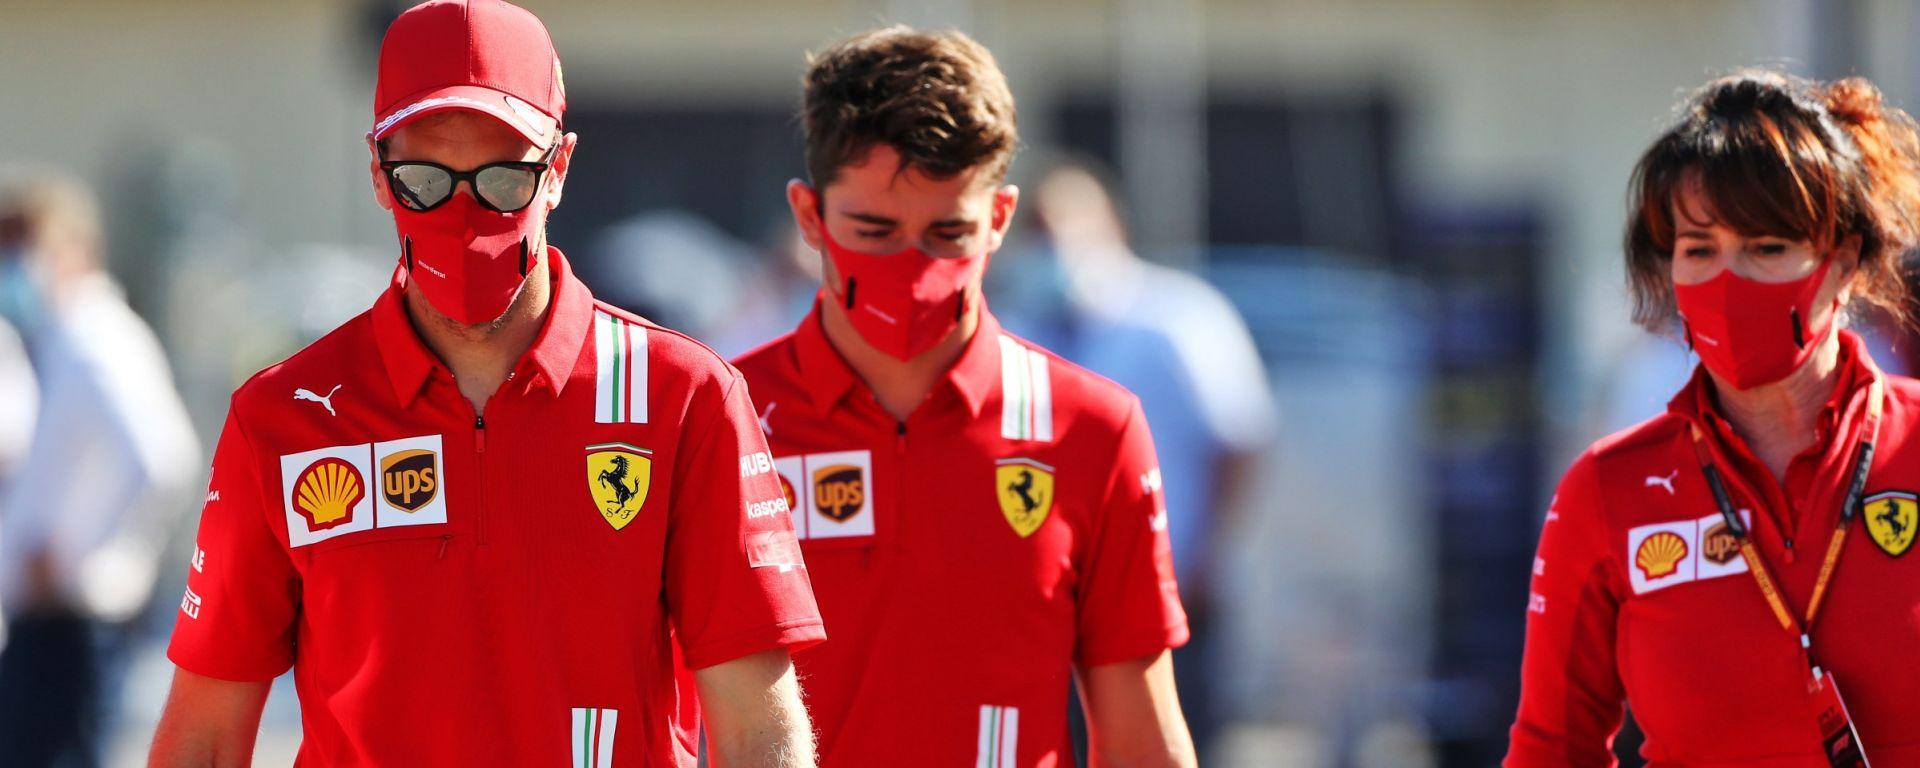 F1 2020: Sebastian Vettel e Charles Leclerc (Ferrari)